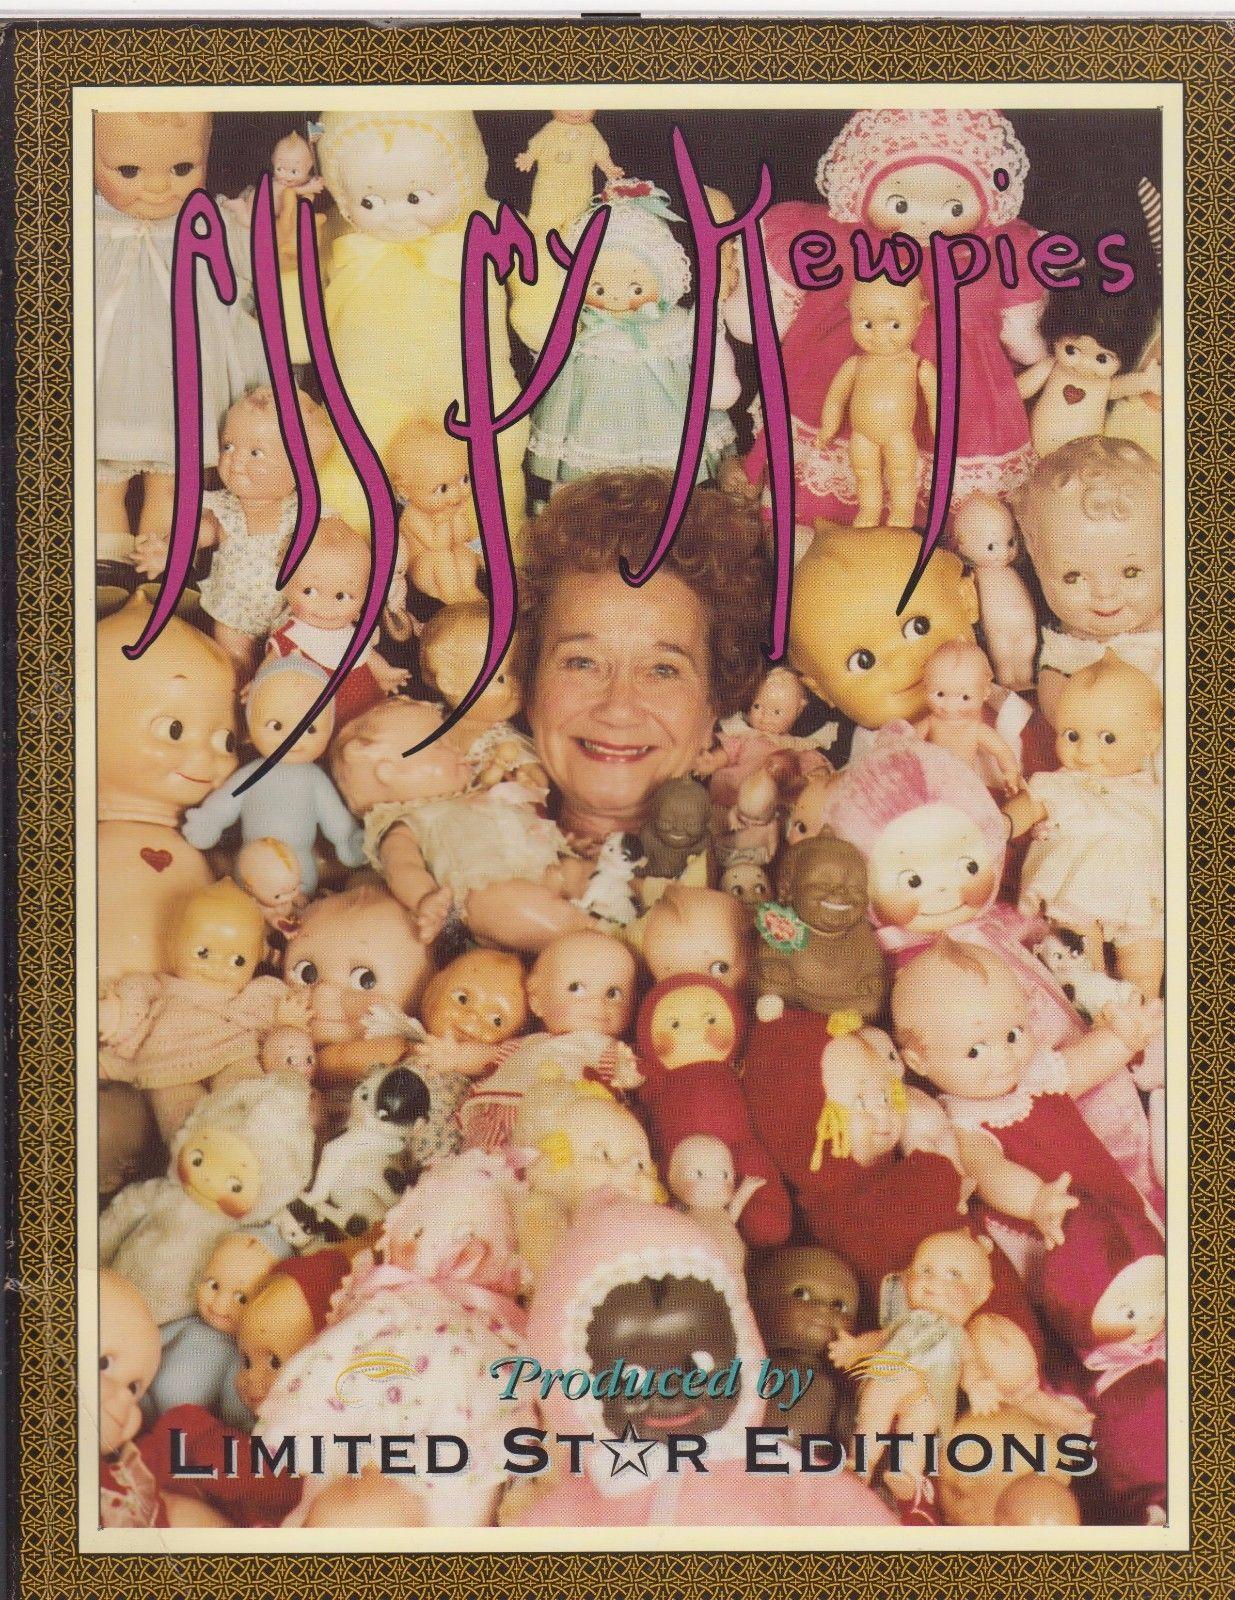 2 Vol Rose O'Neill All My Kewpies Kewpies Autographed by Lois Holliday Holman | eBay